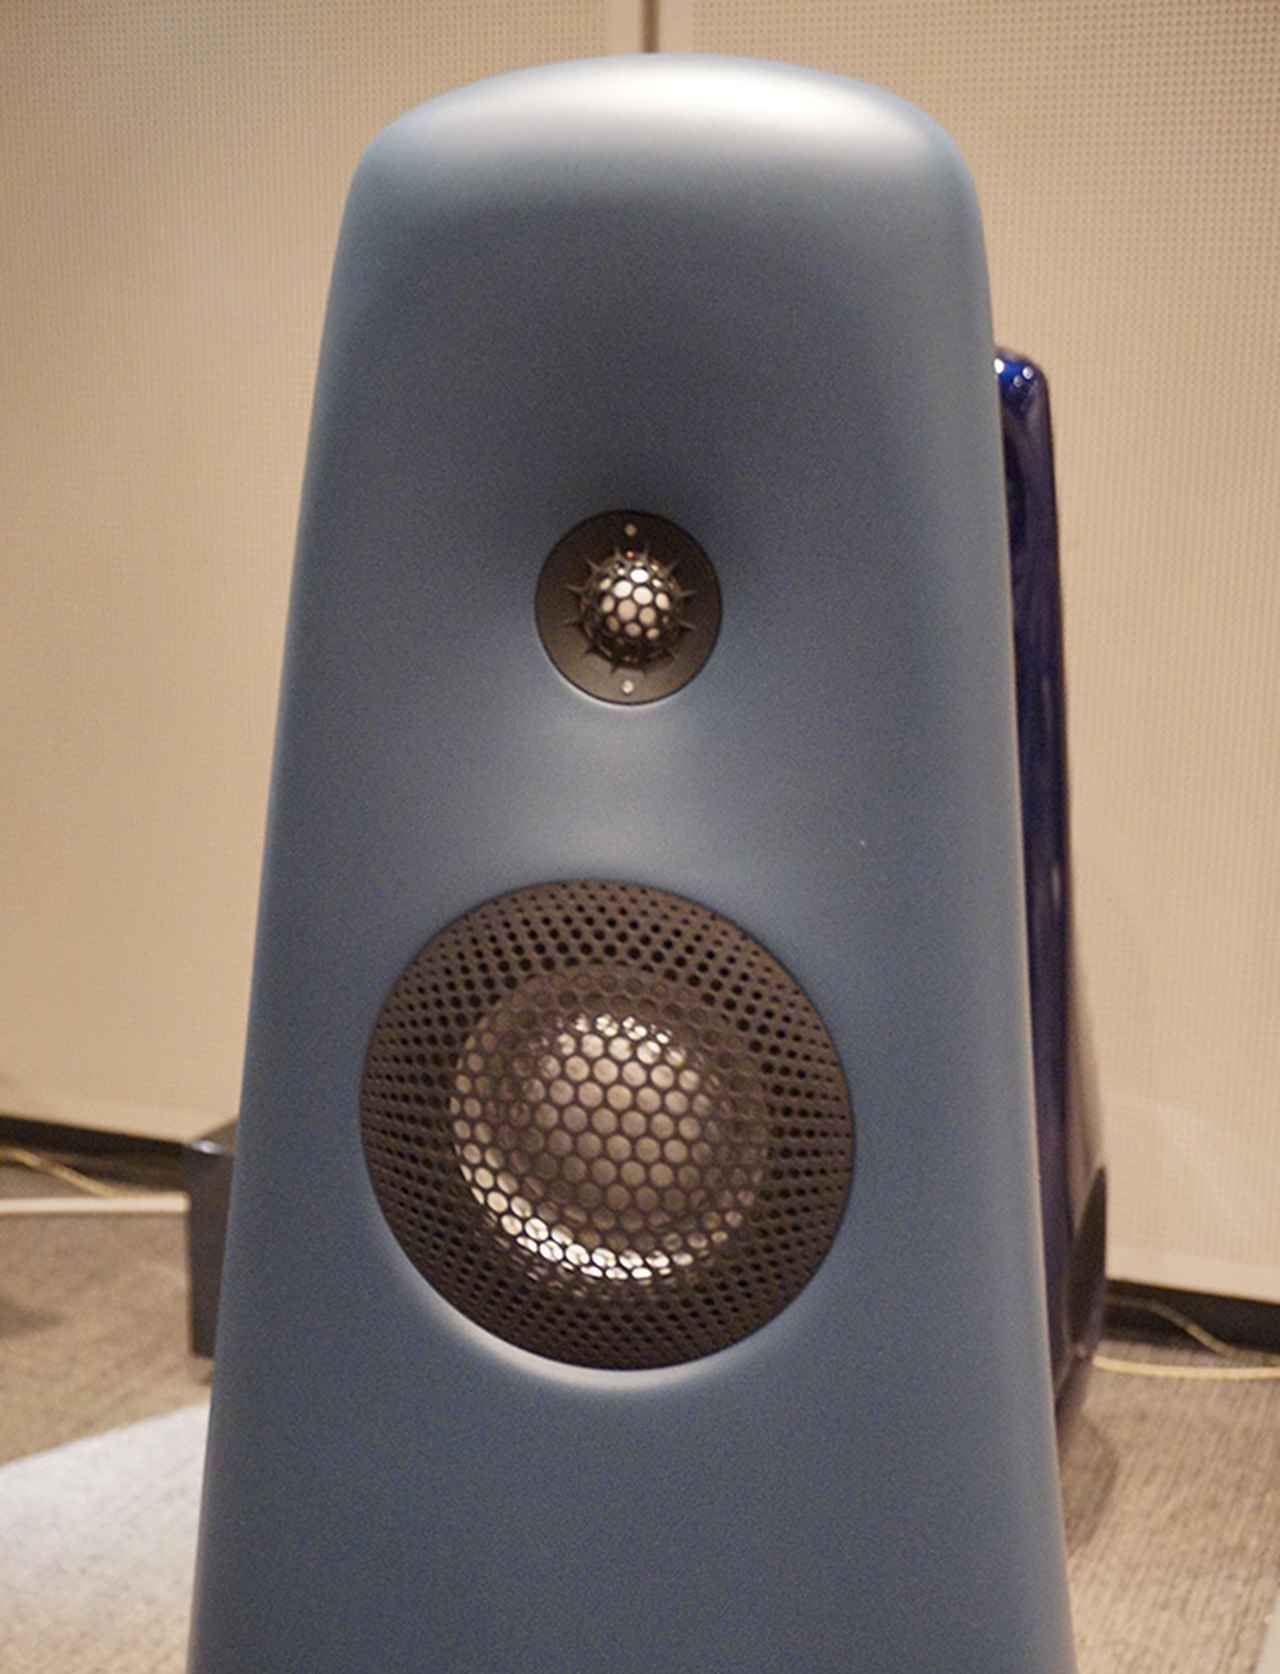 Images : 3番目の画像 - 「VIVID audio、新スピーカー「KAYA」シリーズ発売。CEOも来日した発表会の詳細をレポート」のアルバム - Stereo Sound ONLINE